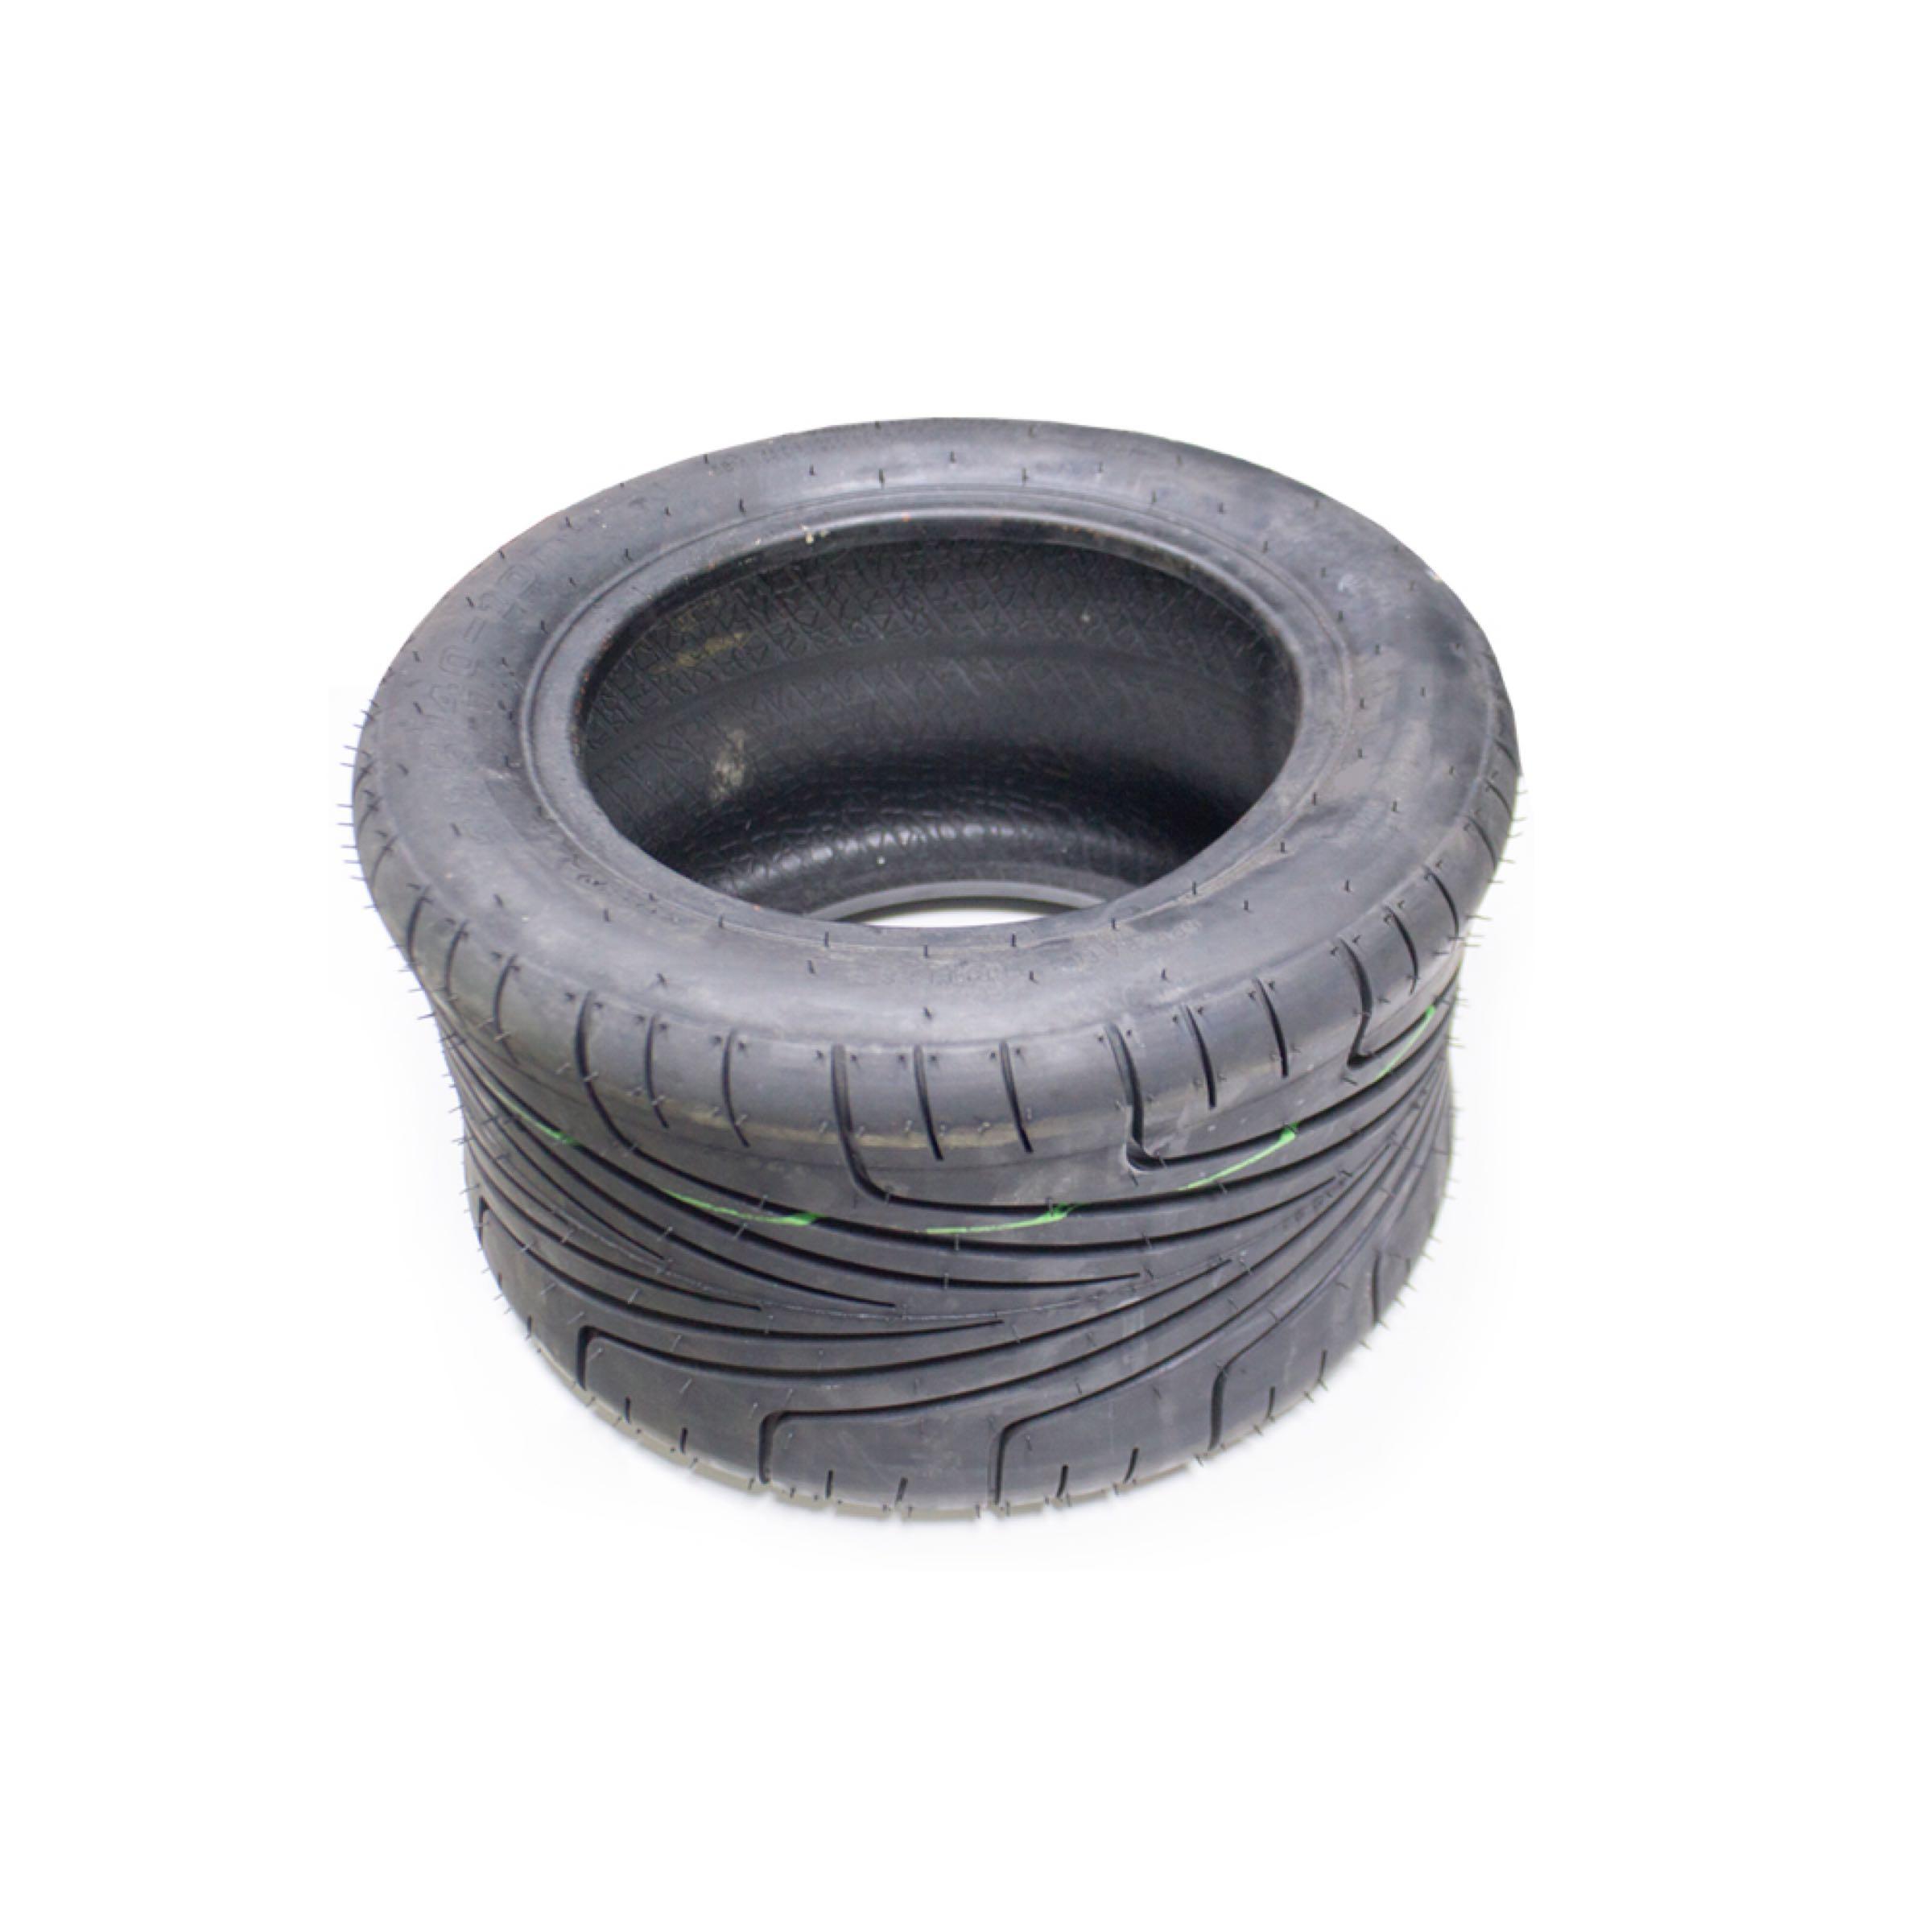 Watta tyre (long range)